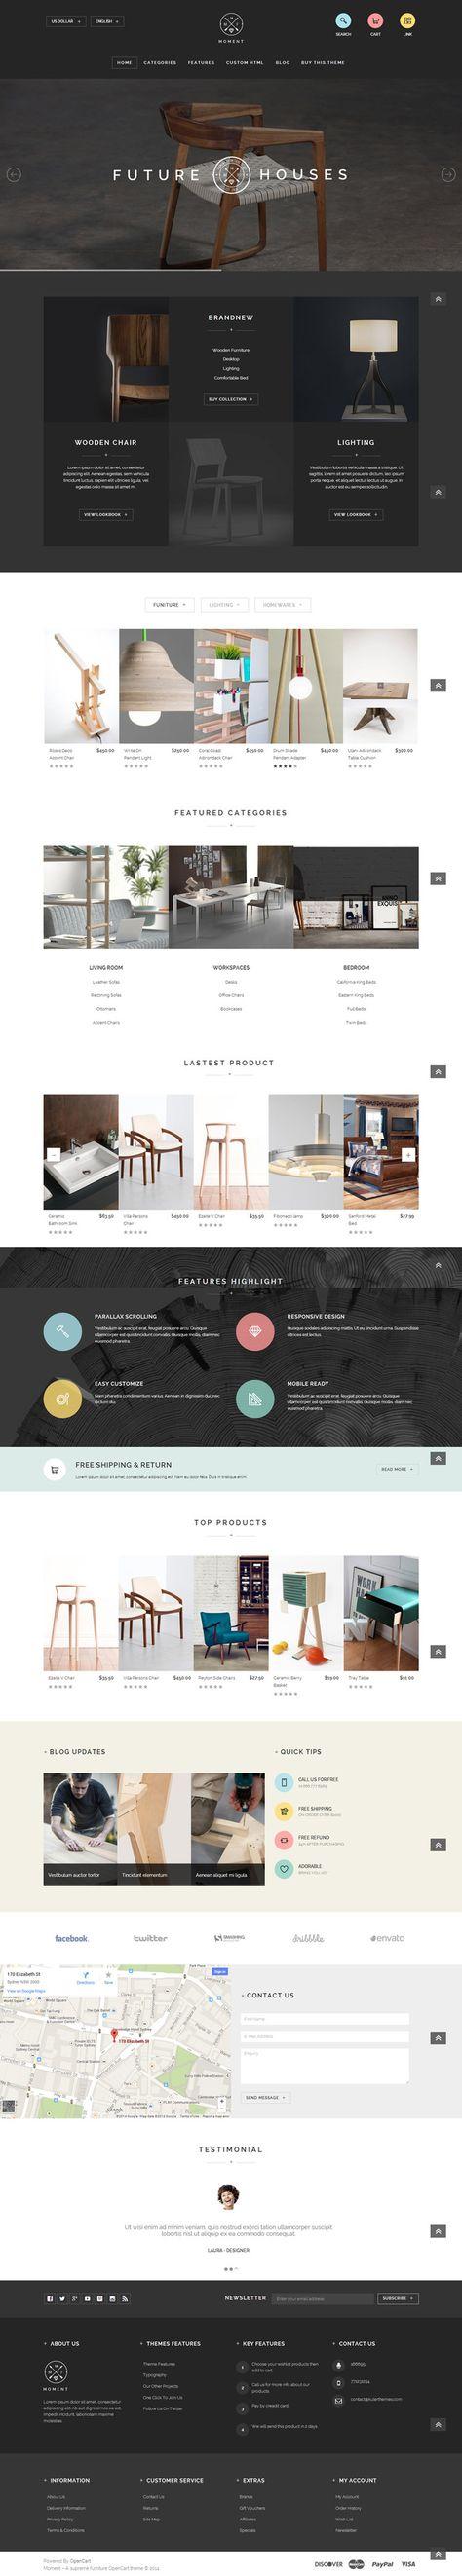 20 Clean Web Design Inspiration 2015